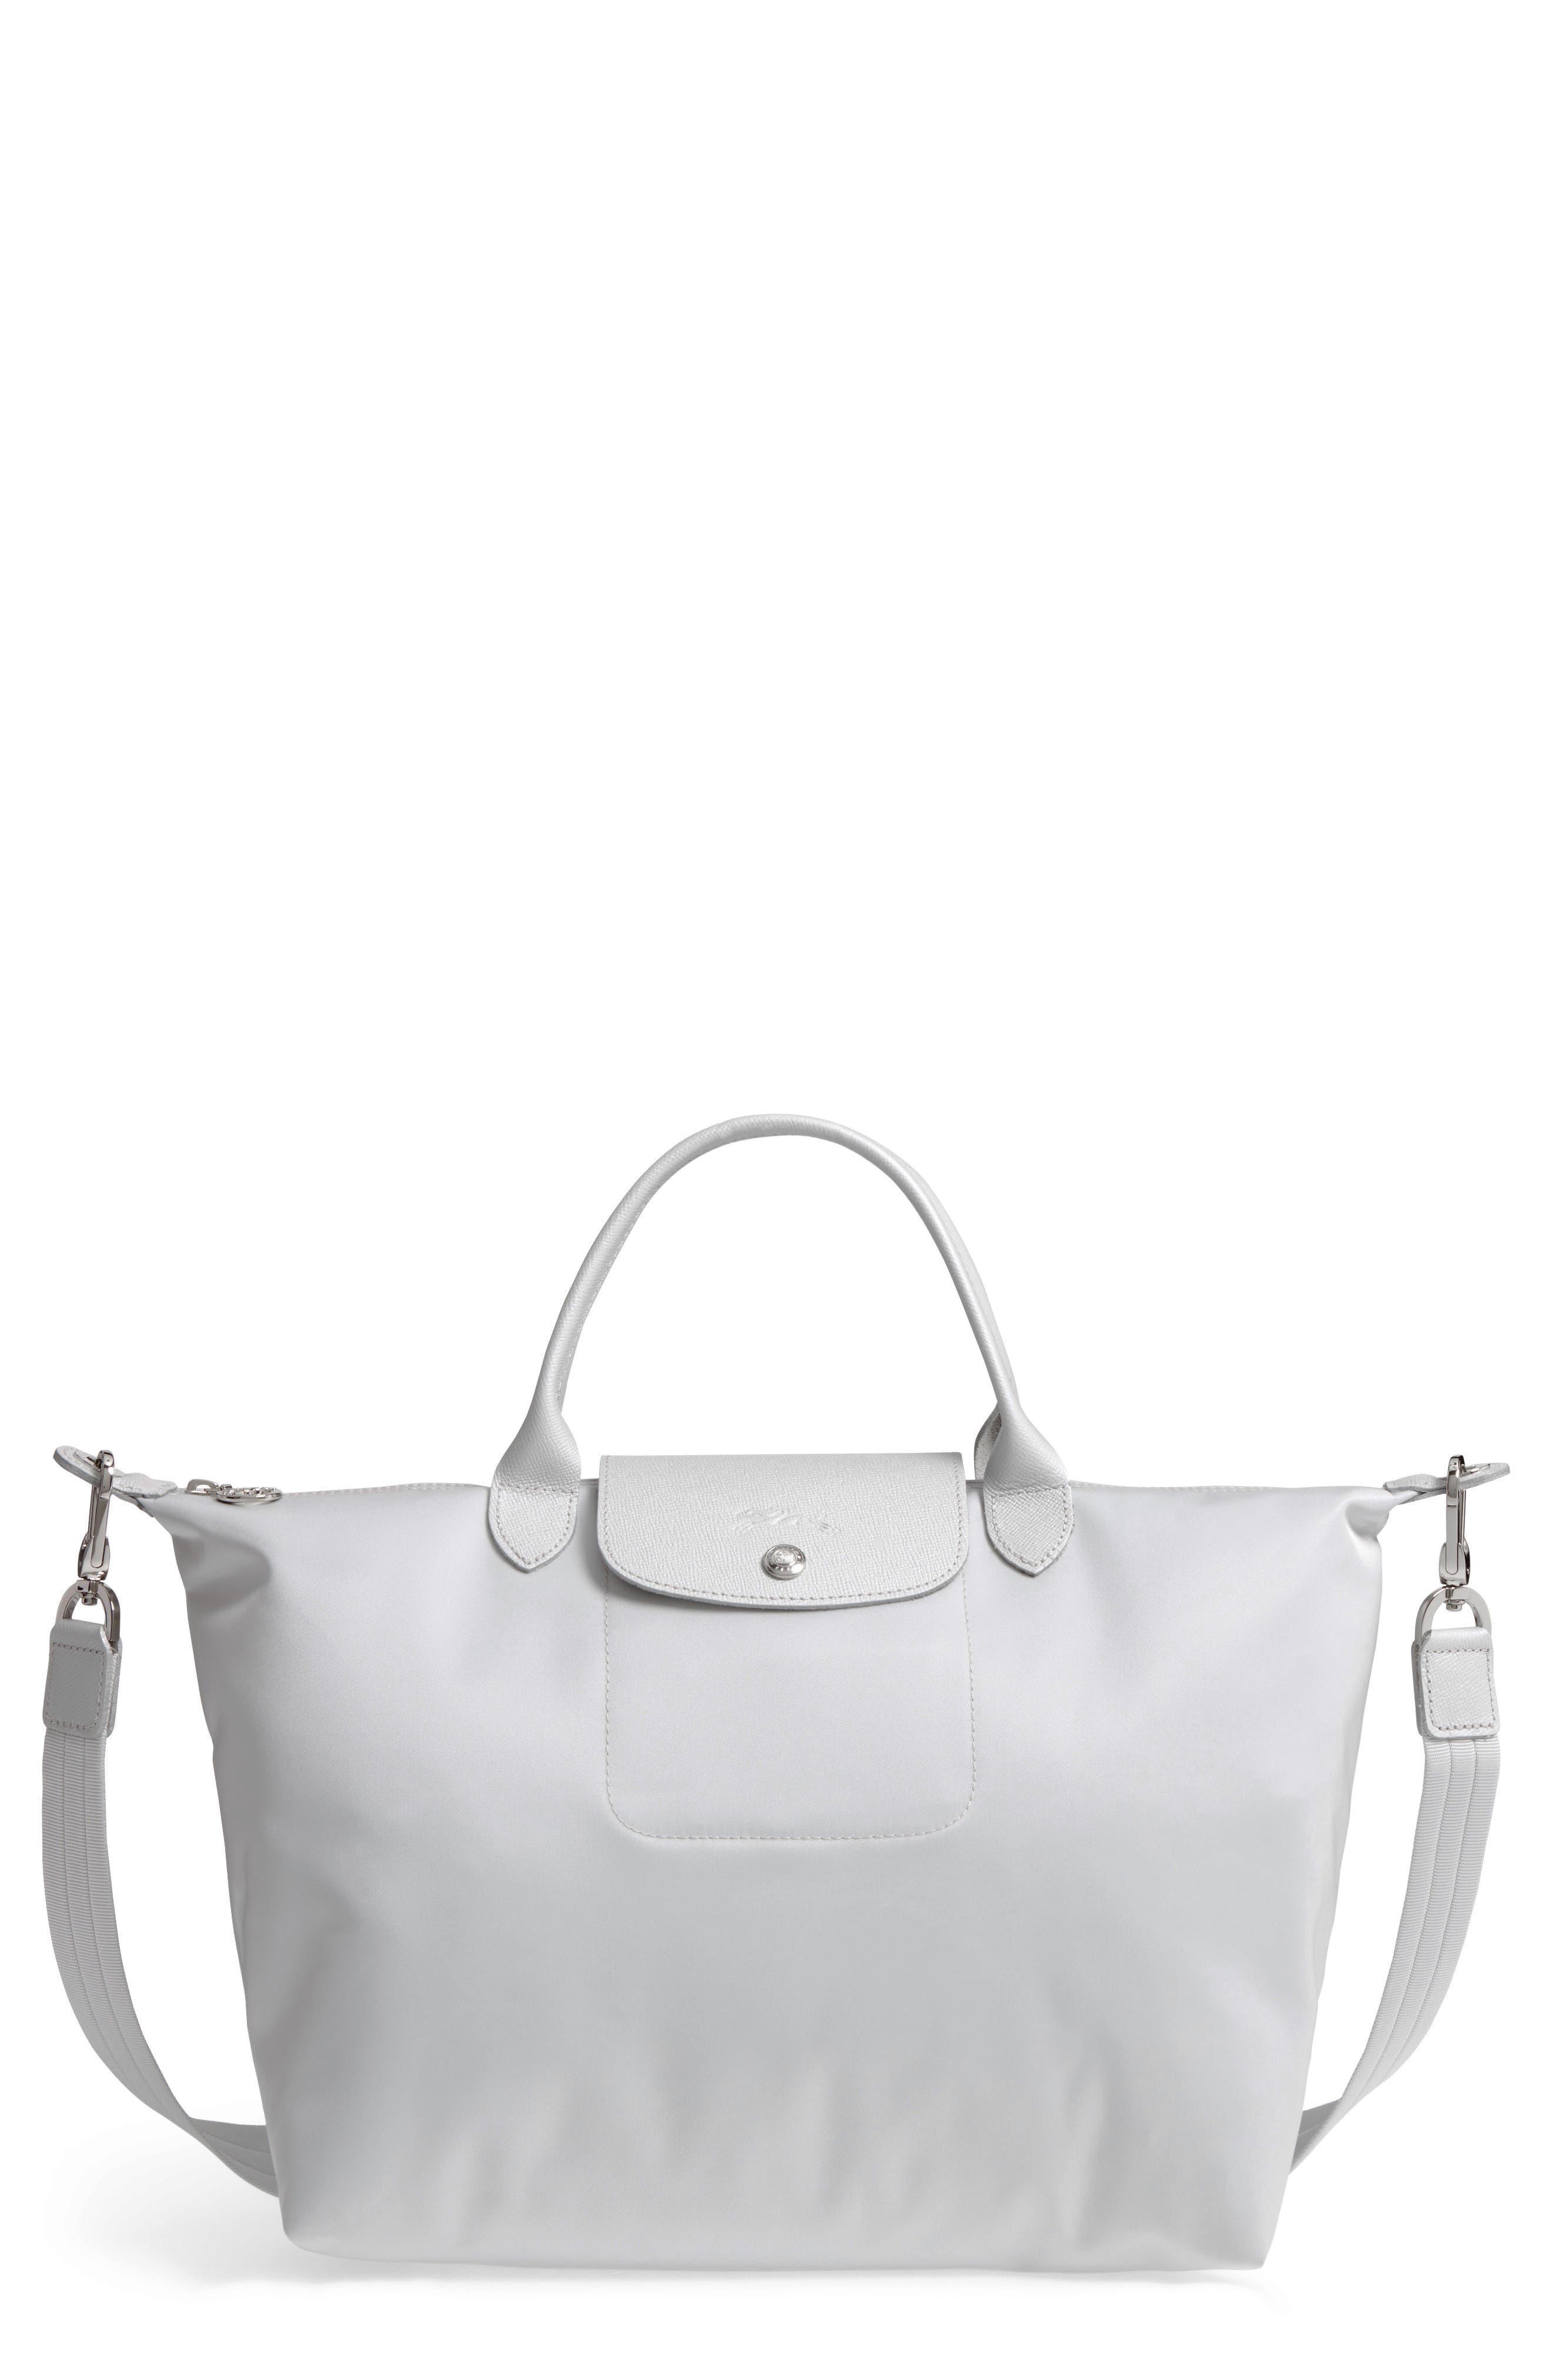 Alternate Image 1 Selected - Longchamp 'Medium Le Pliage Neo' Nylon Tote